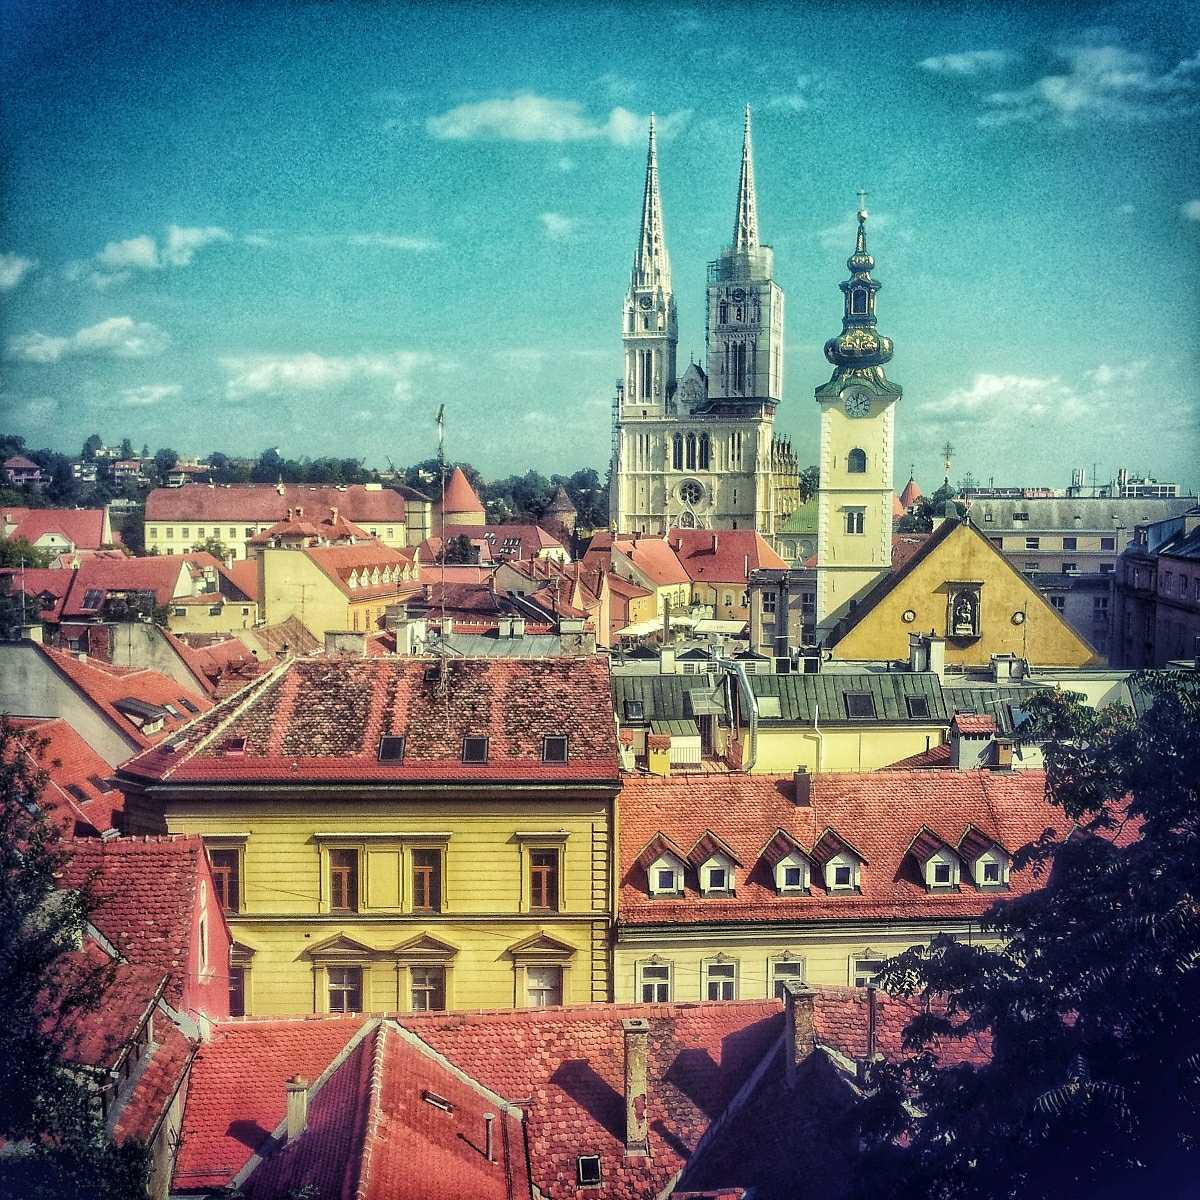 Looking back on December: In Zagreb, Croatia